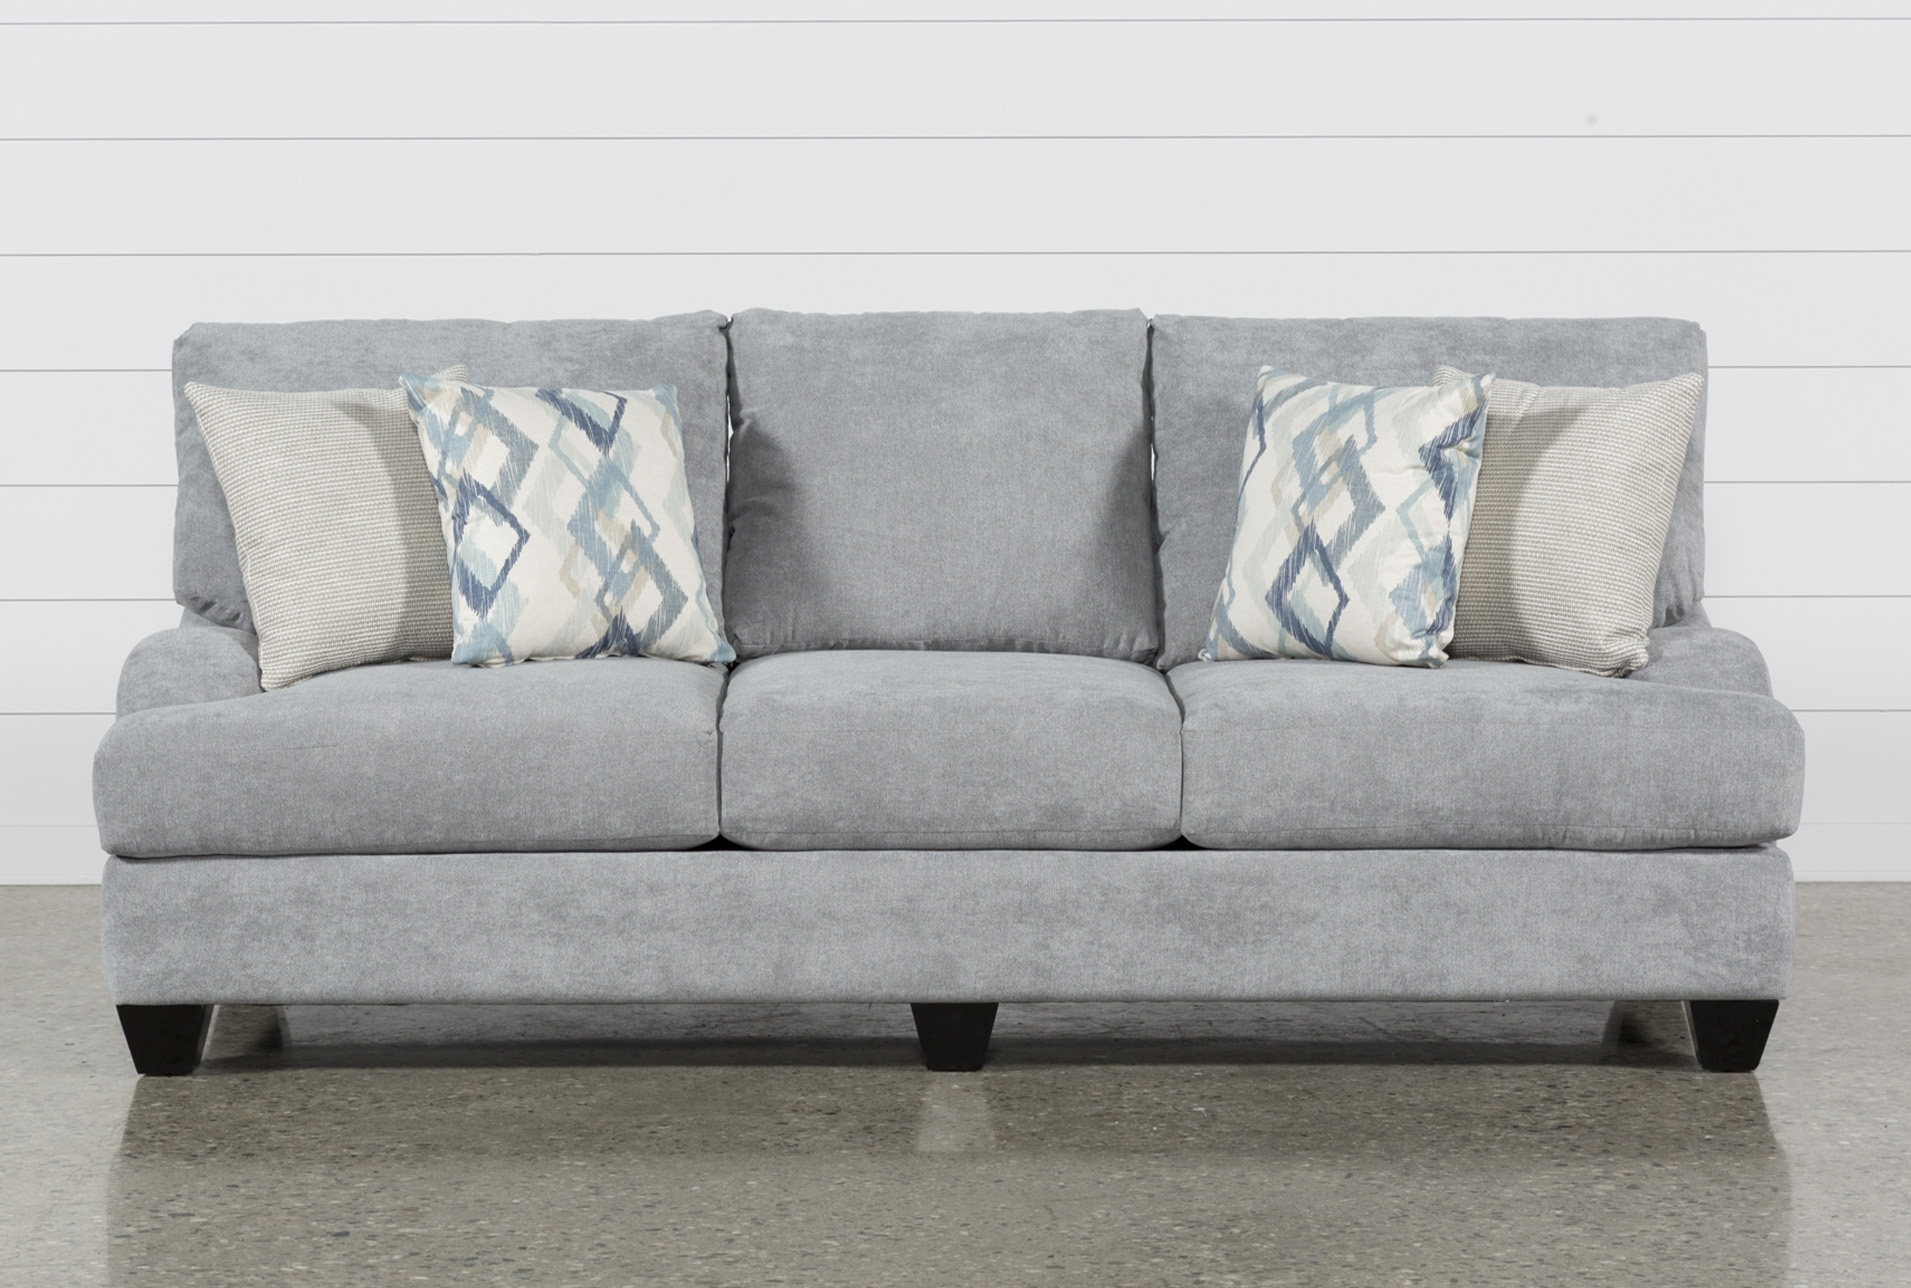 Sierra Foam Ii Sofa | Pinterest | Products In Elm Grande Ii 2 Piece Sectionals (View 12 of 25)